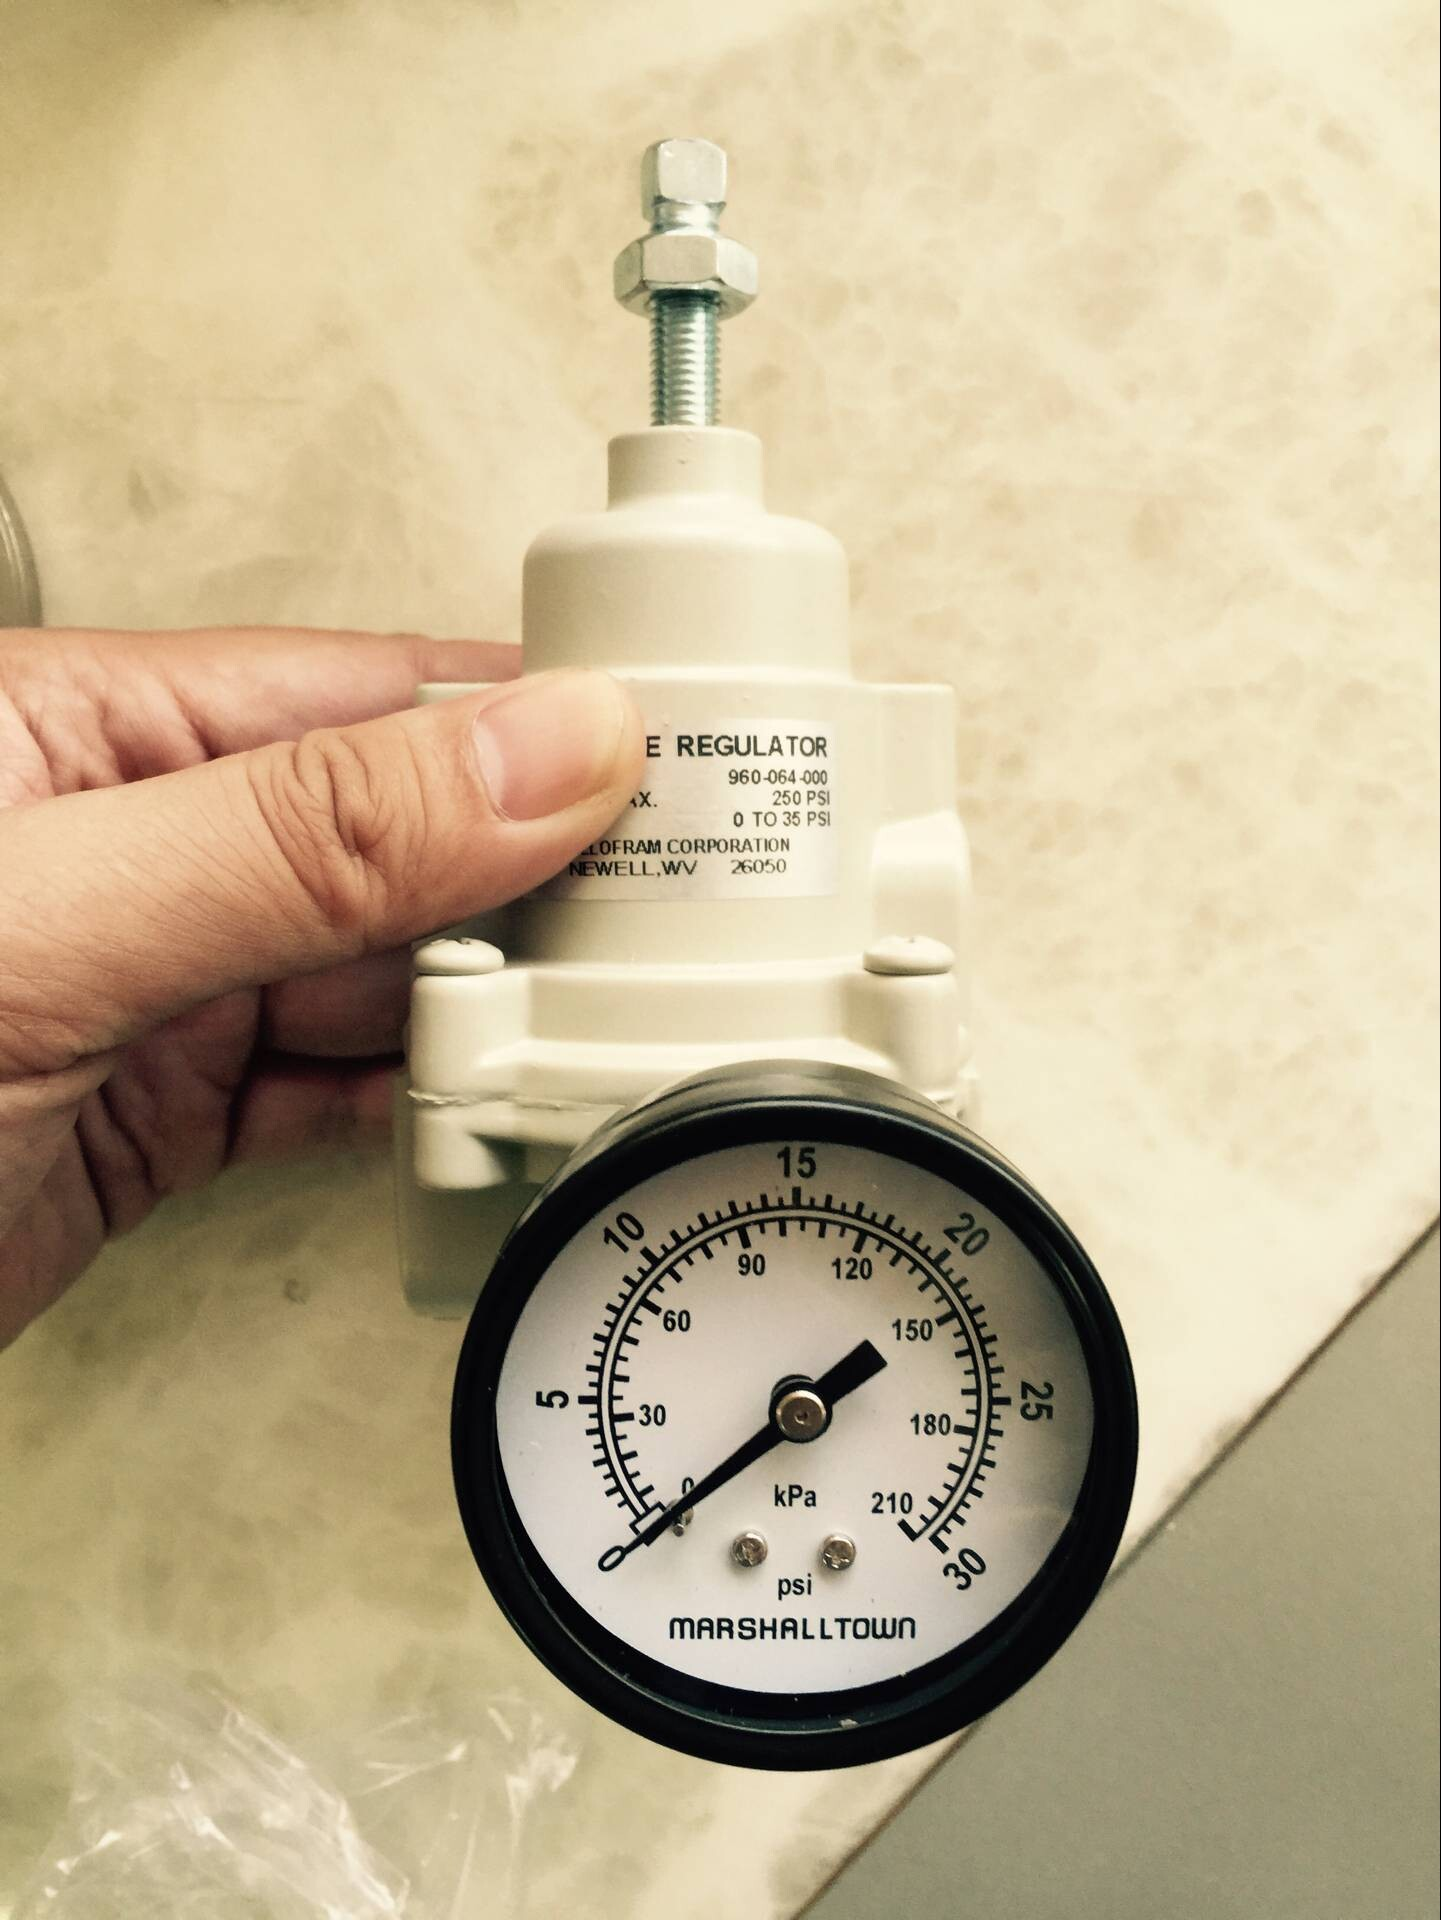 US BELLOFRAM valve 960-064-002 (without overflow without exhaust table) bellofram t77 vacuum regulator 960 500 000 2psi vacuum low pressure valve